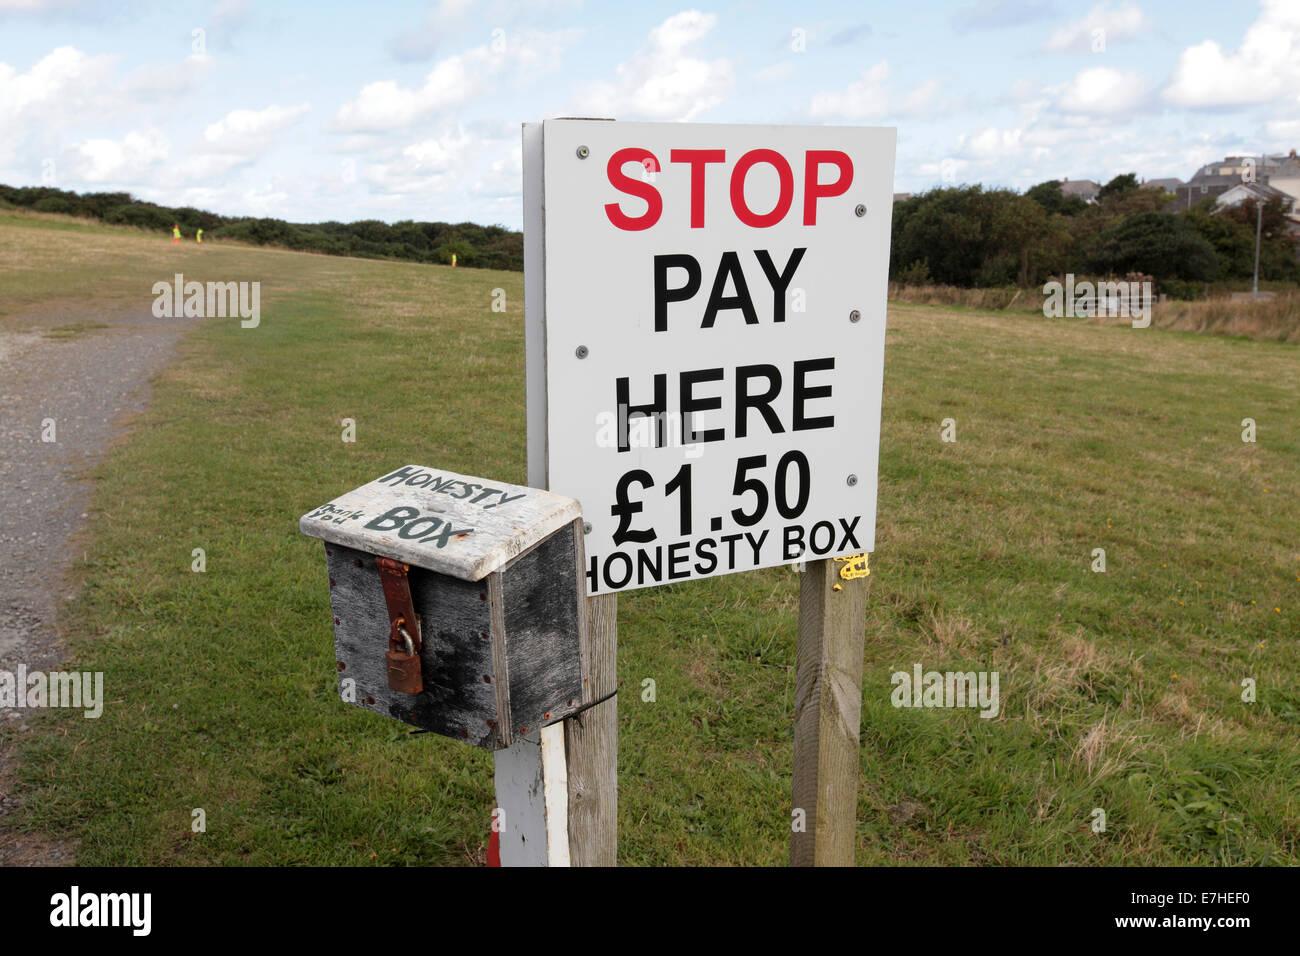 Honesty box, car park Tintagel, Cornwall, UK - Stock Image